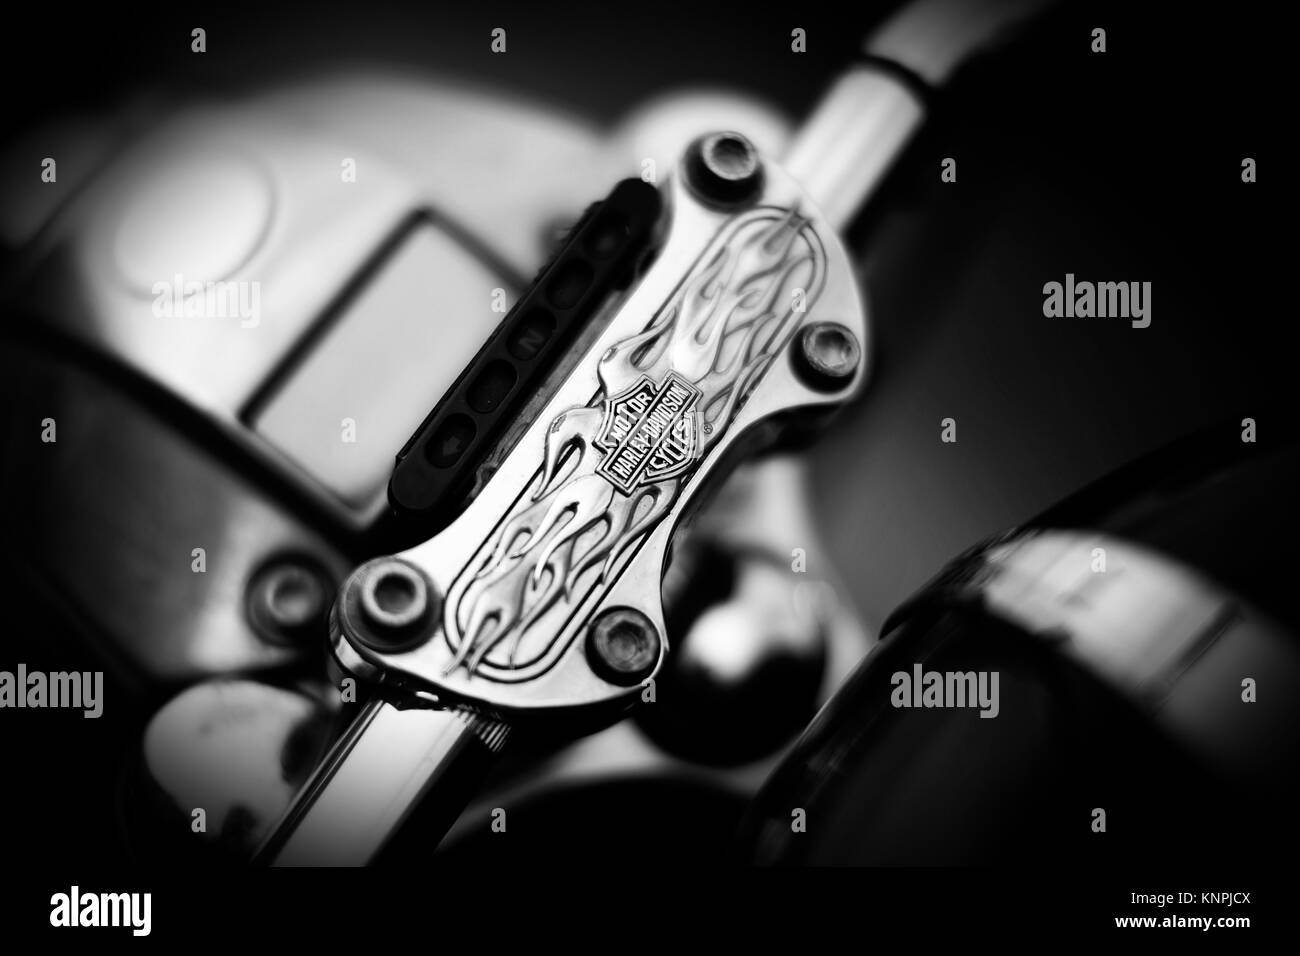 Harley Davidson handlebars - Stock Image